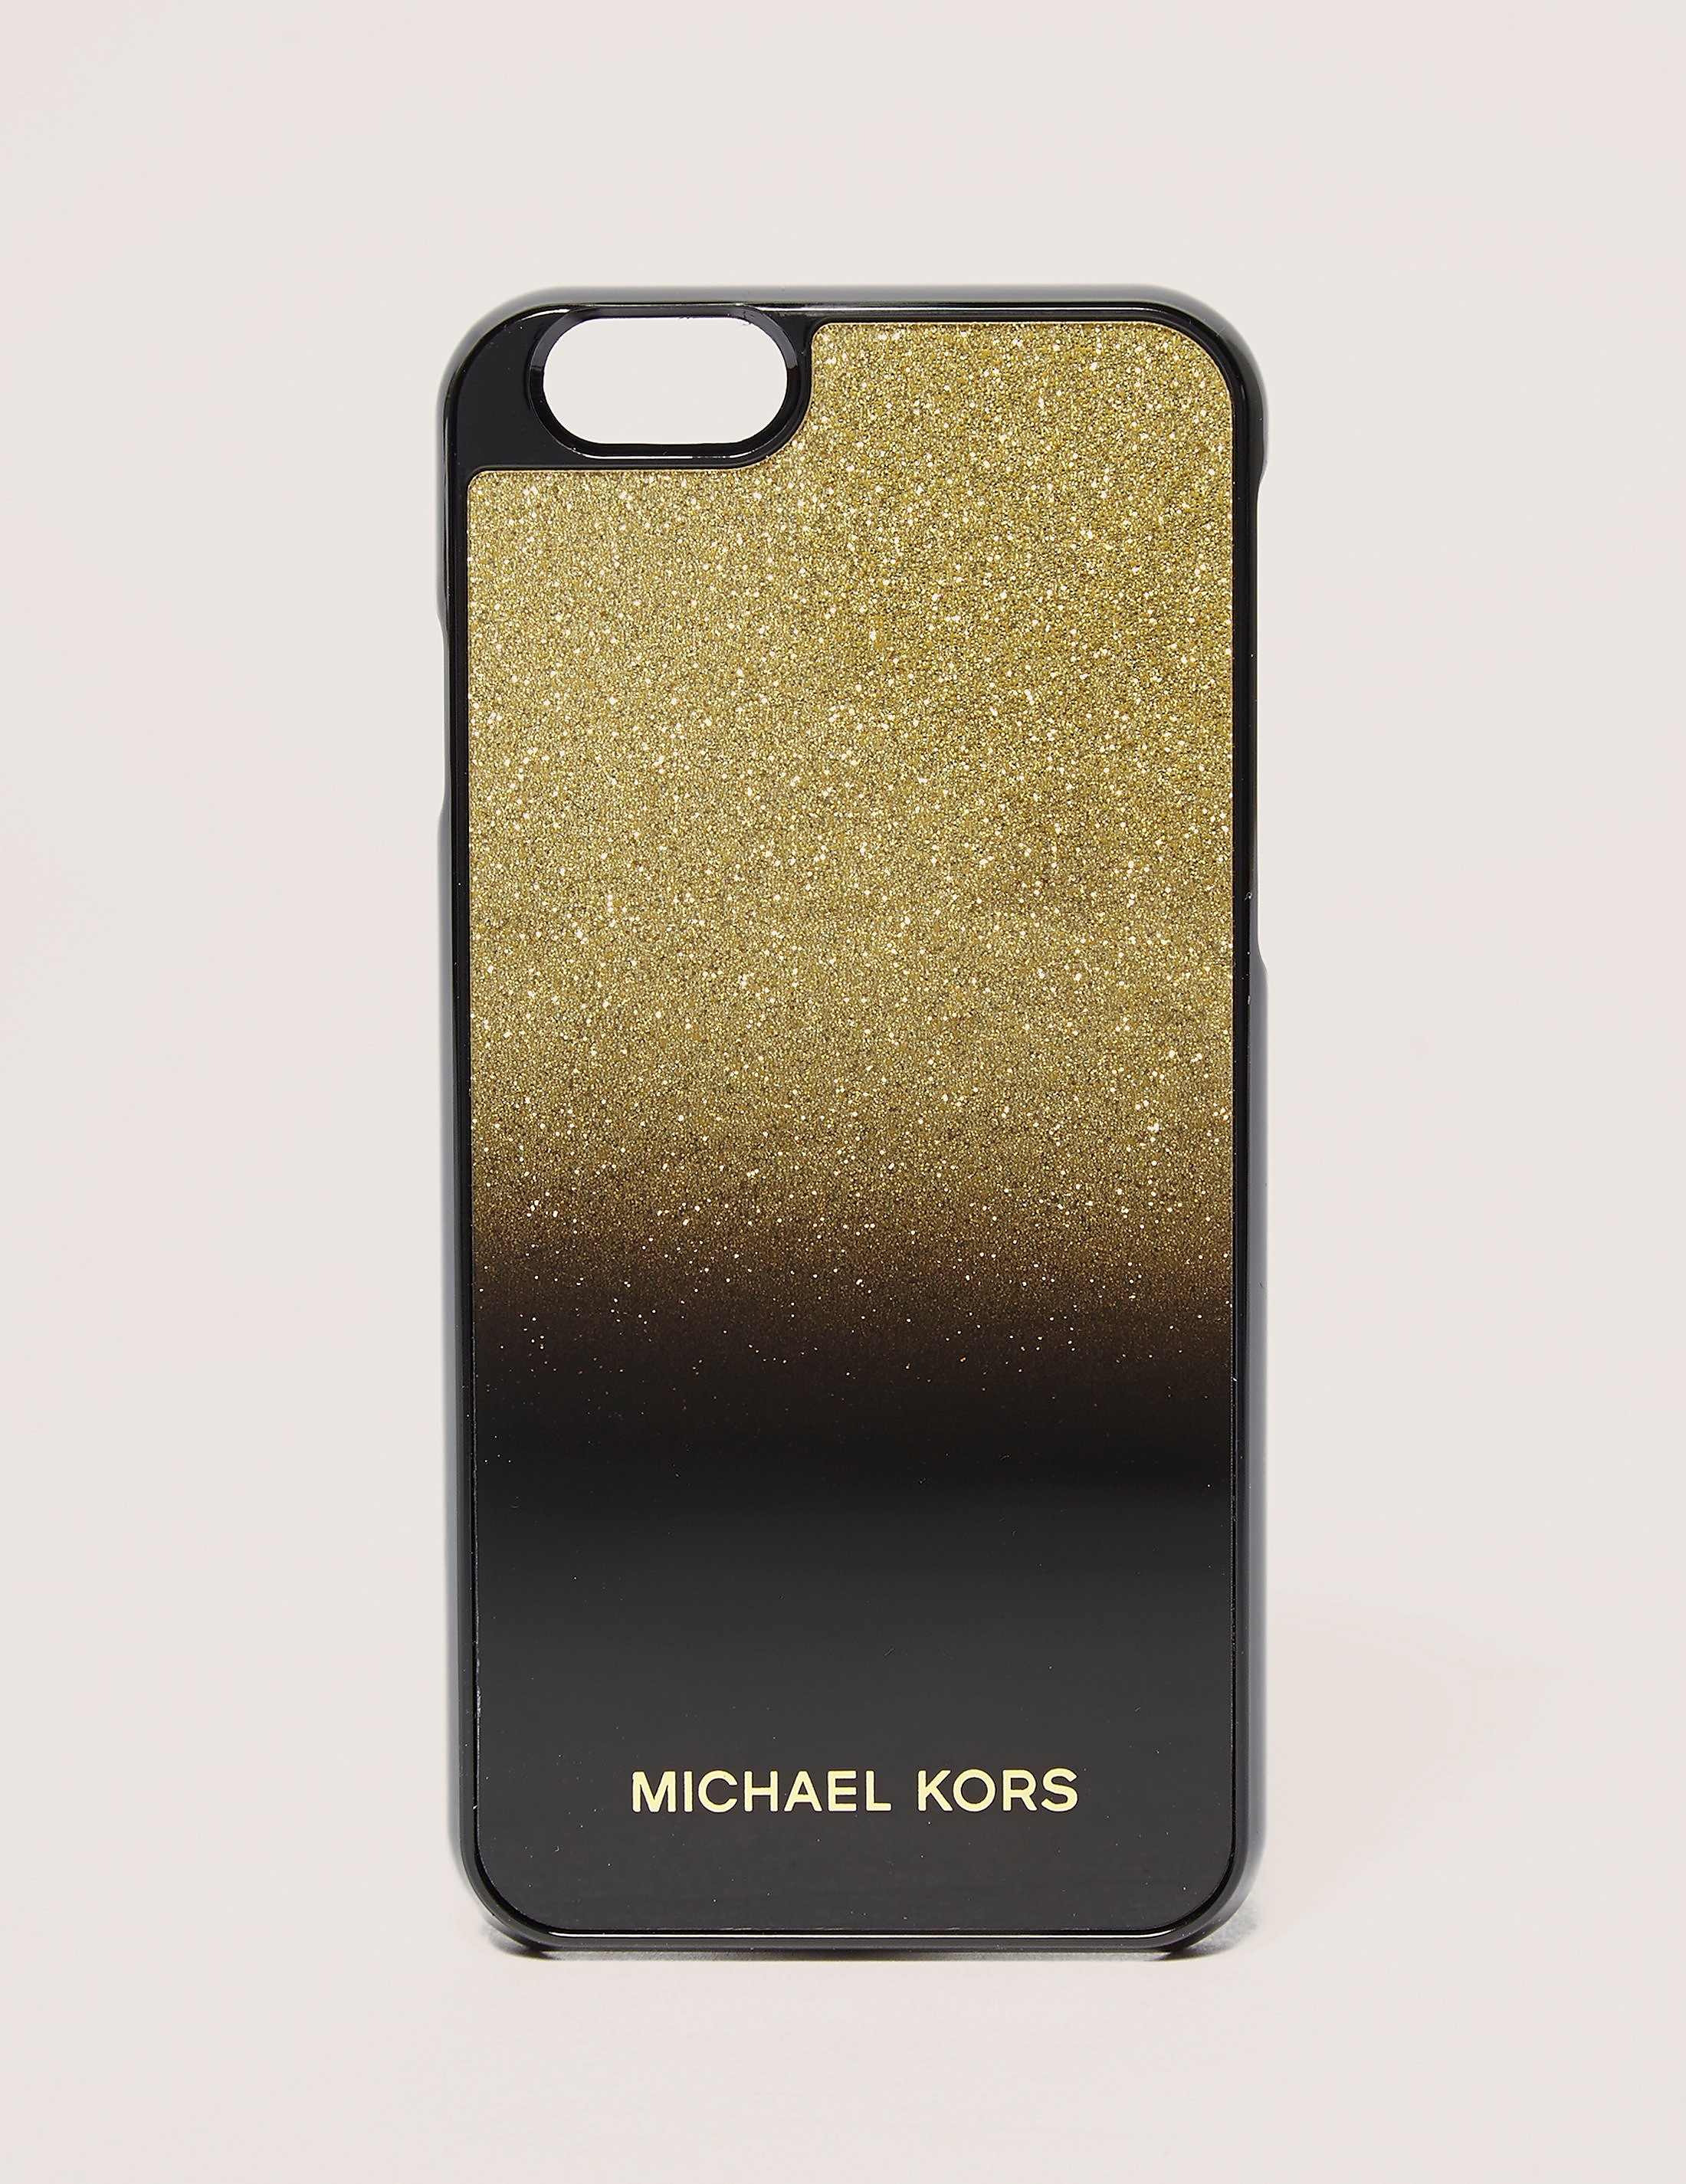 Michael Kors IPhone 6 Cover